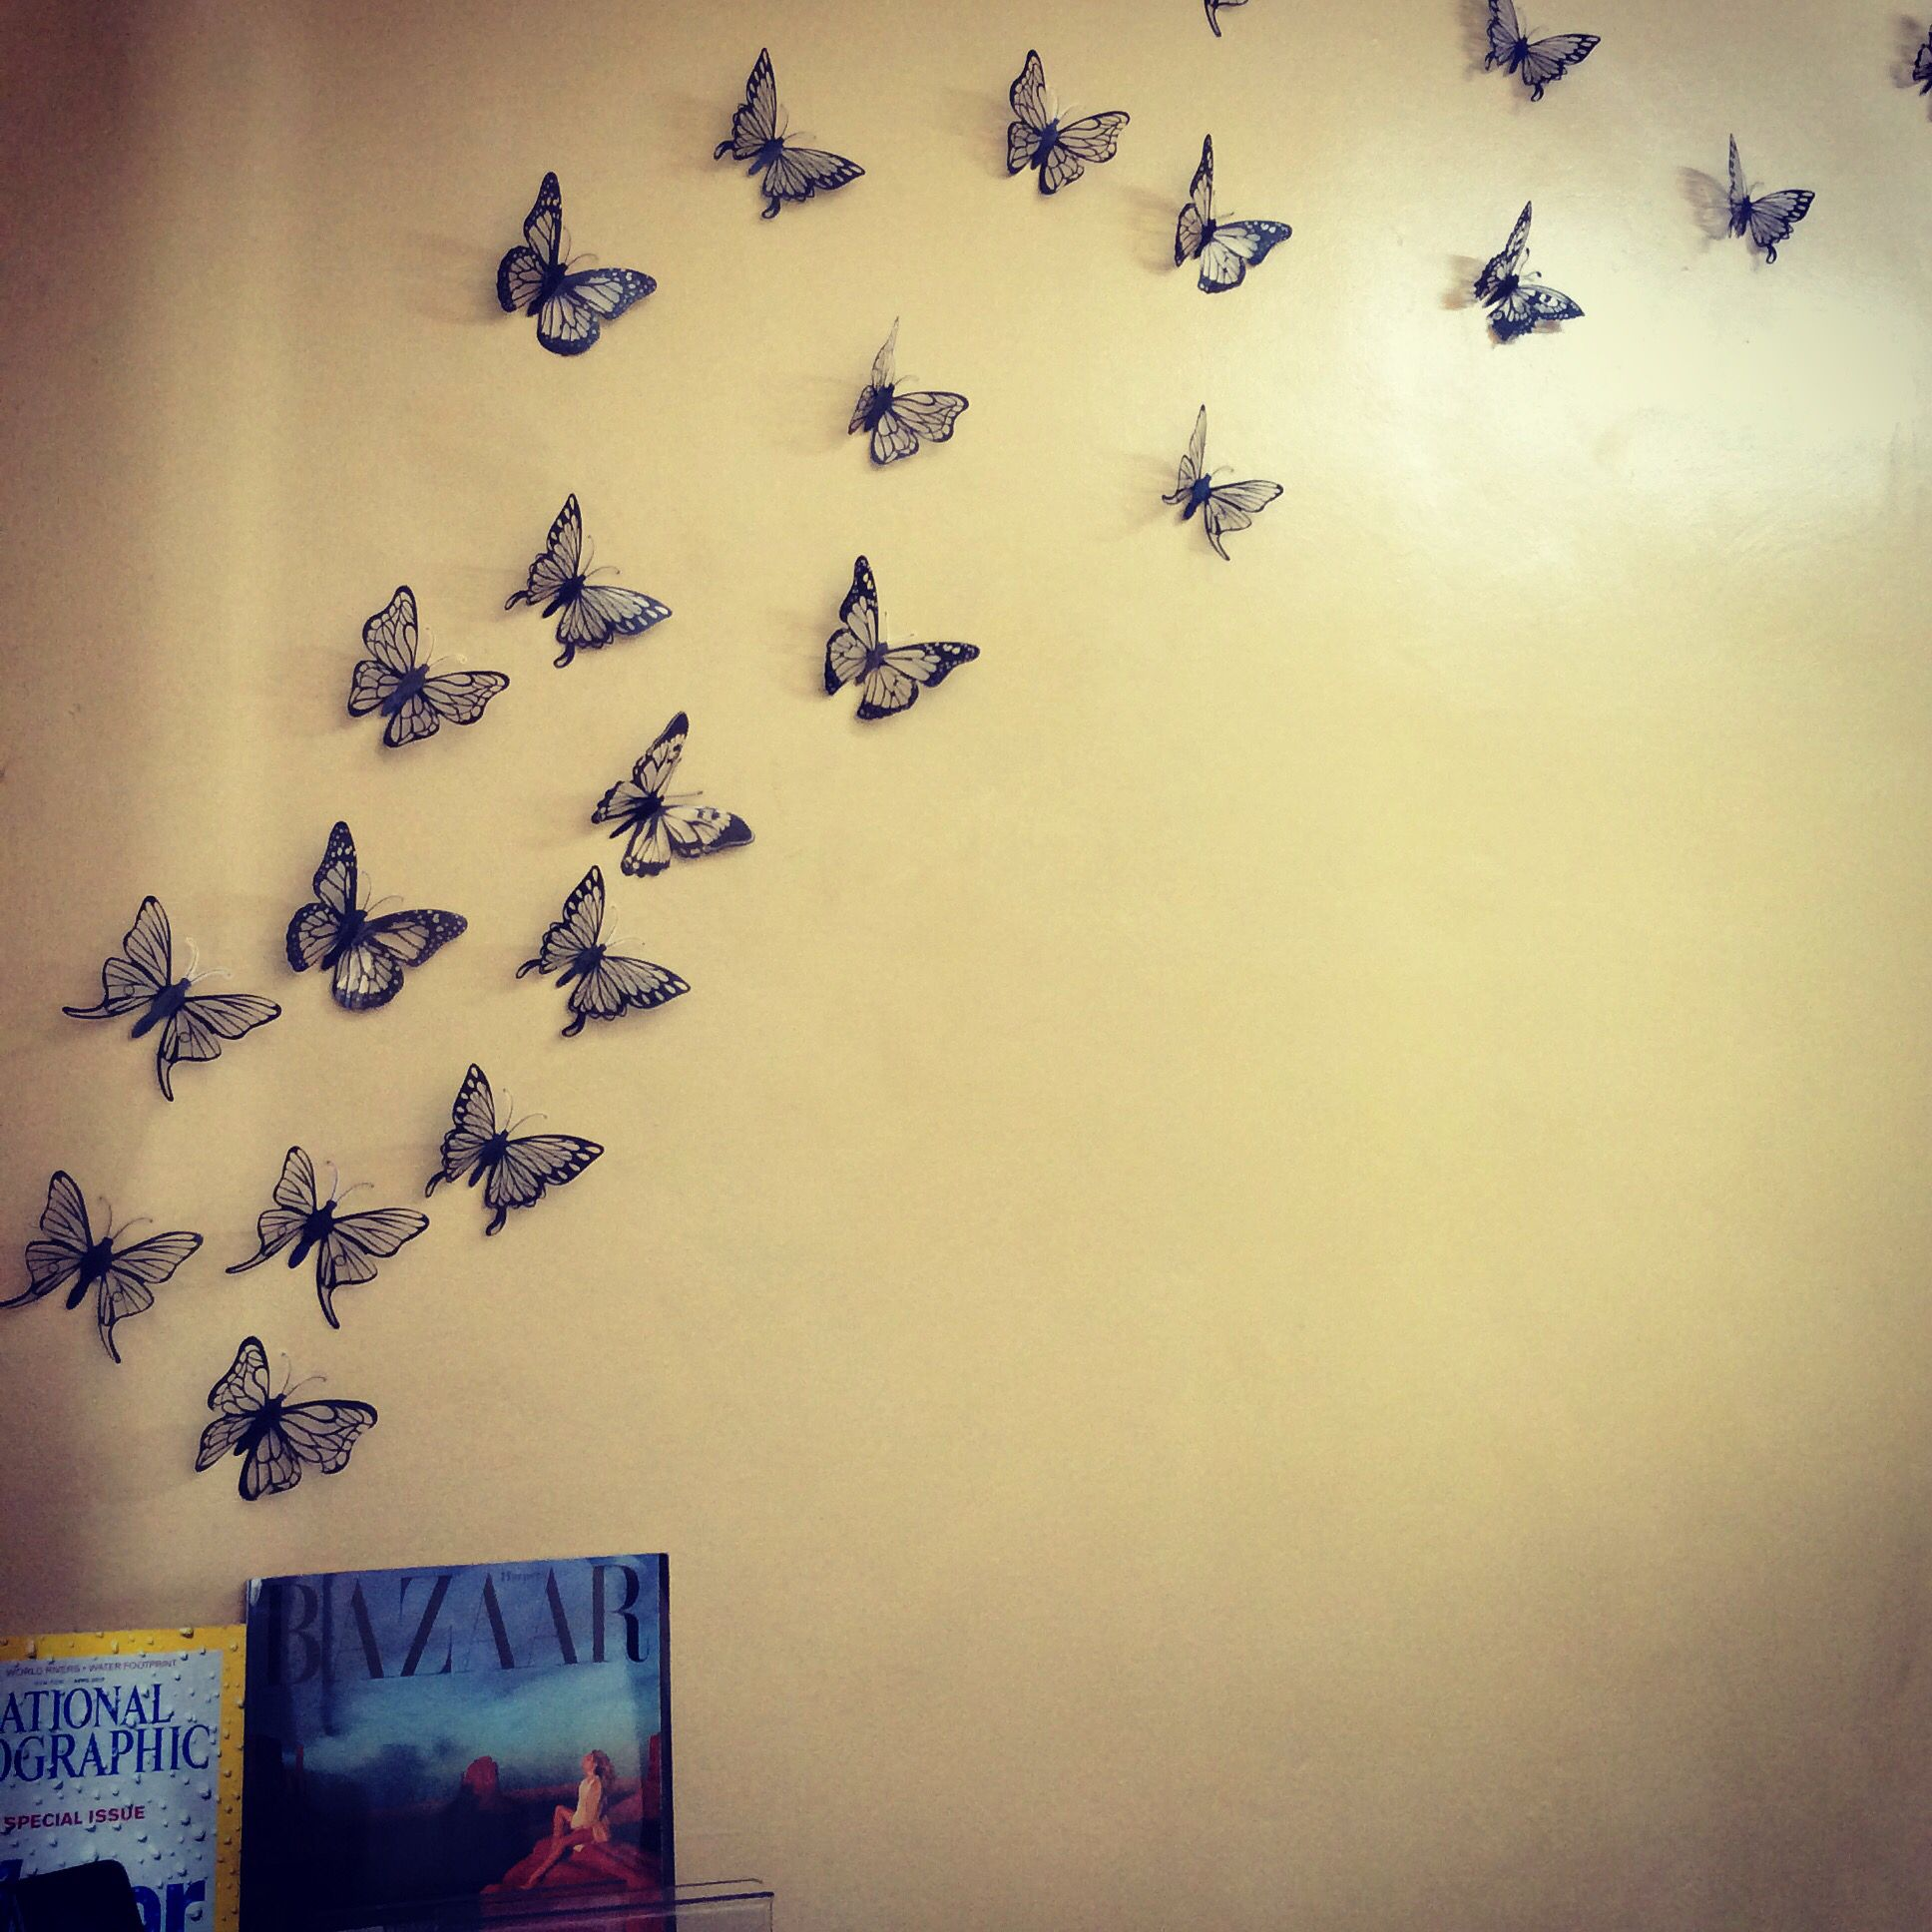 Fantastic Butterfly Wall Art Decor Photos - The Wall Art Decorations ...